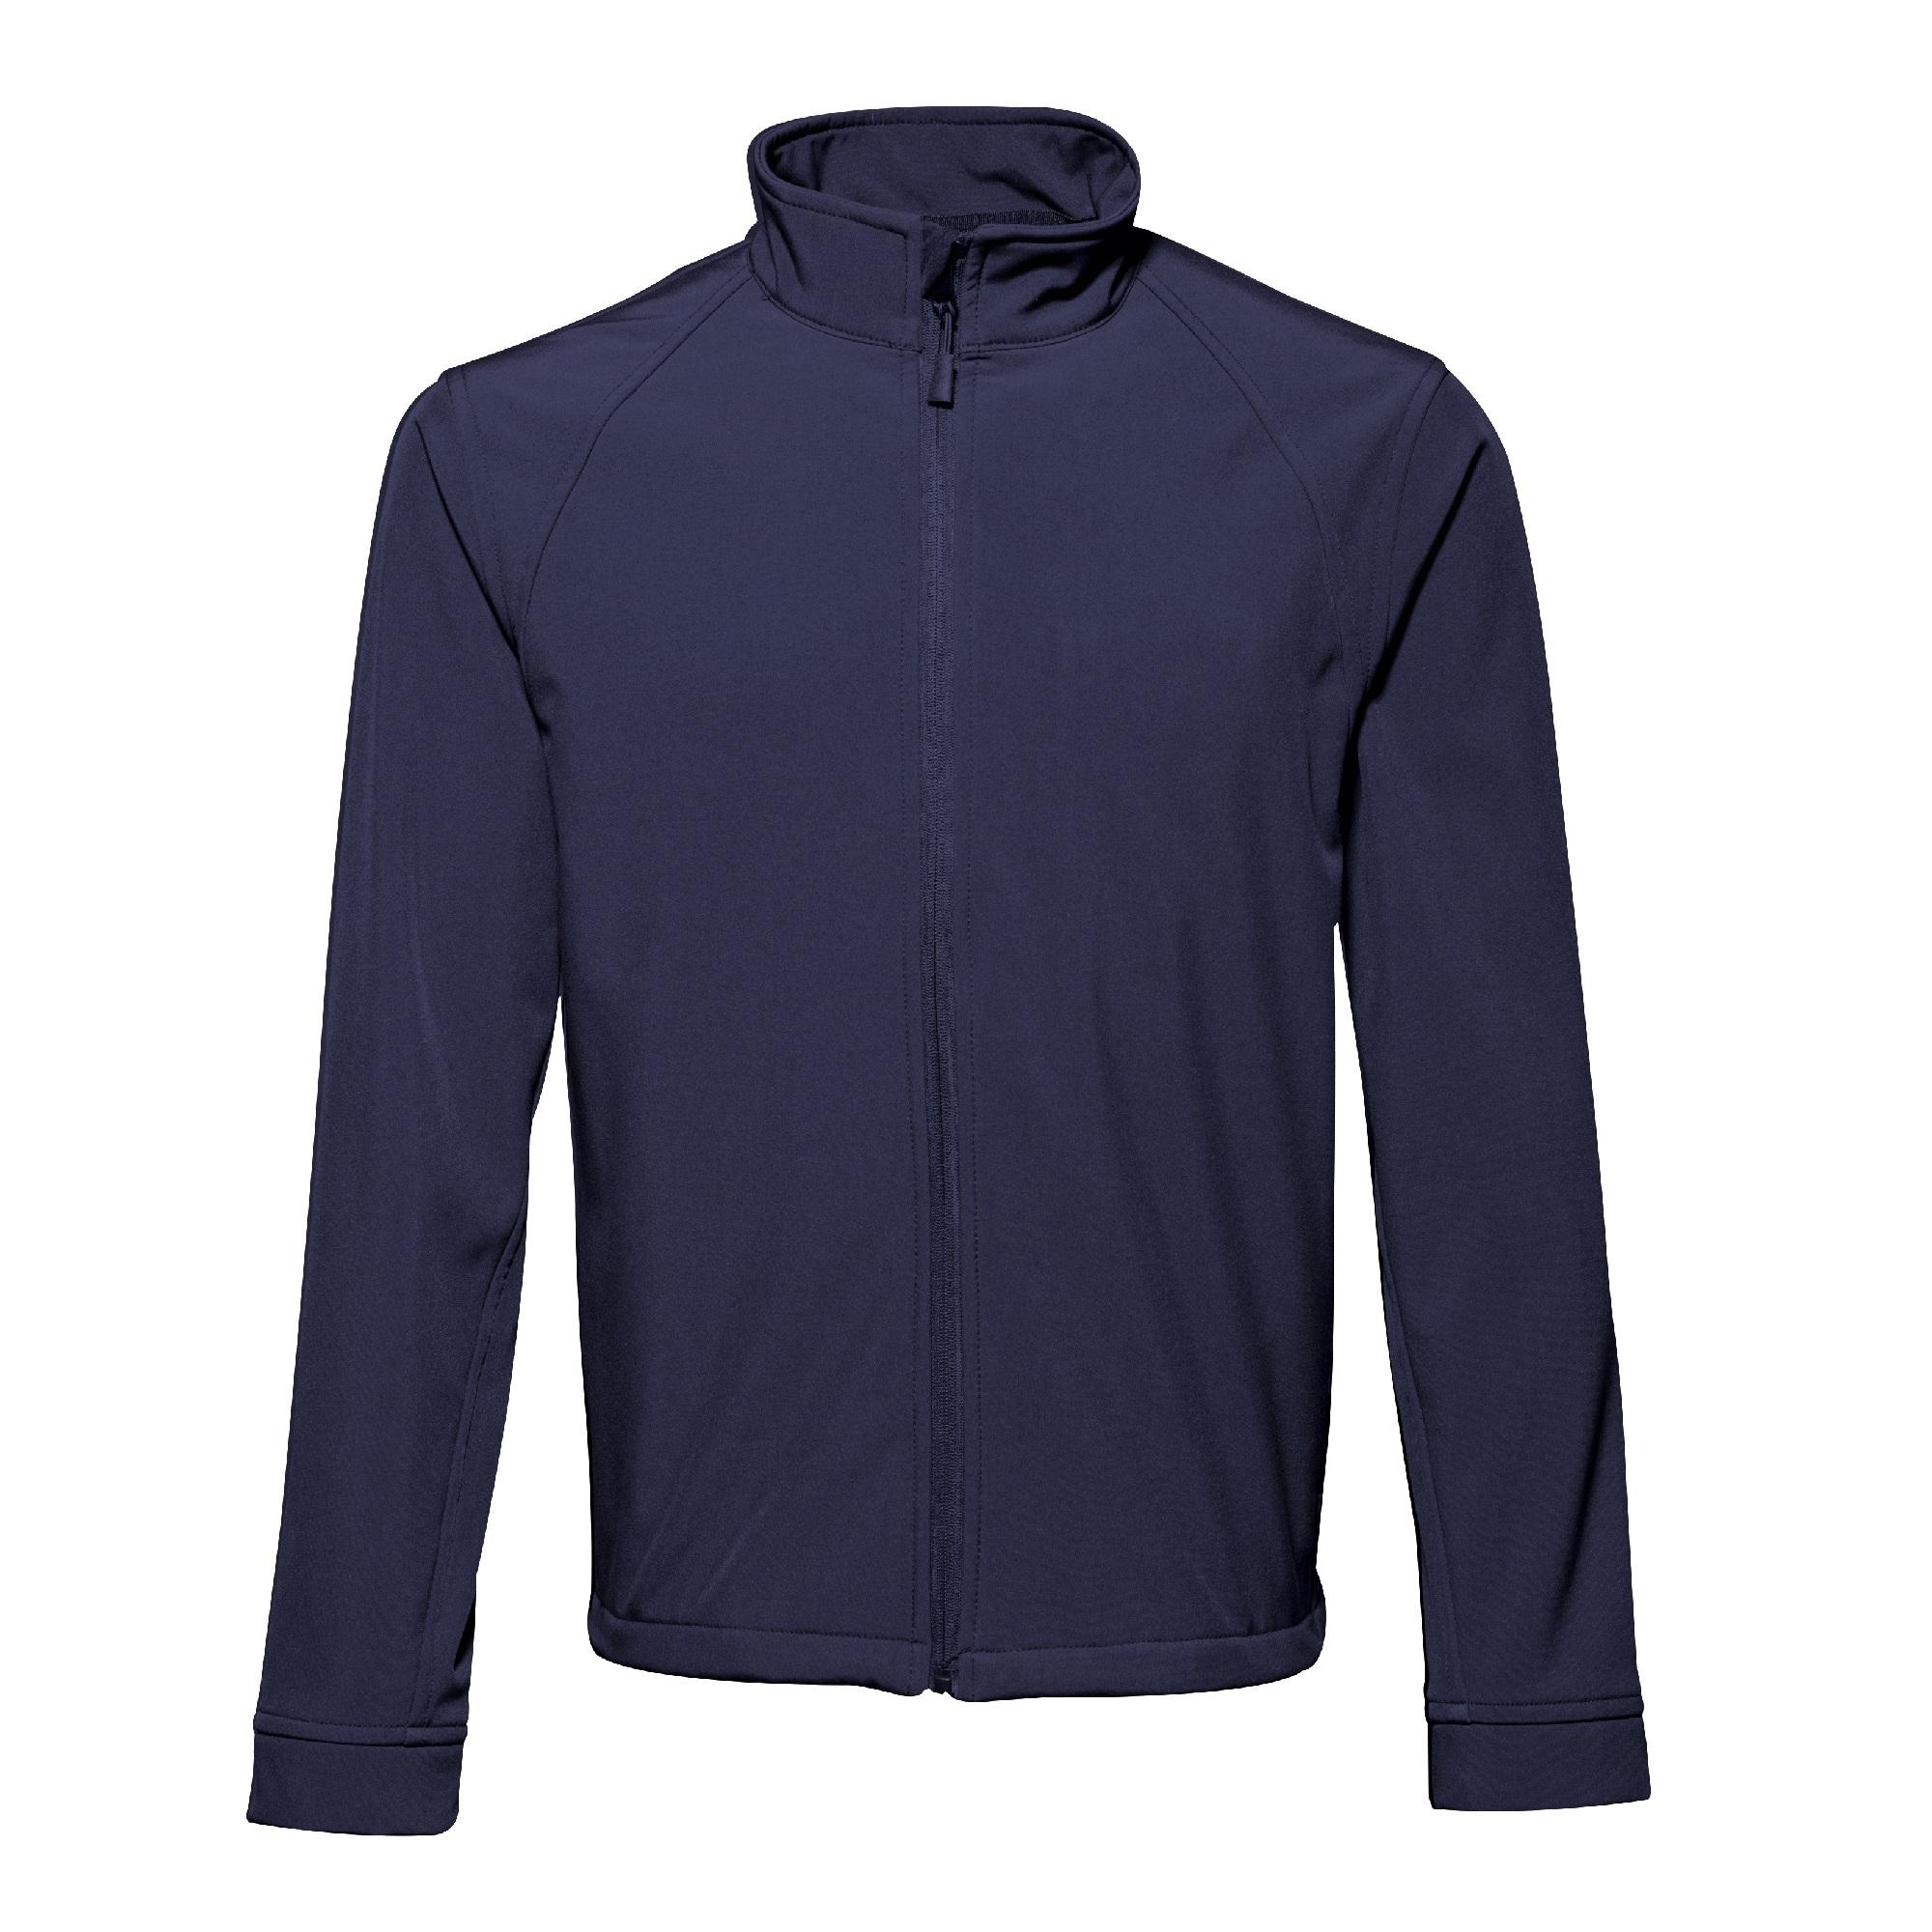 Ts012 Softshell Jacket Gdb Manufacturing